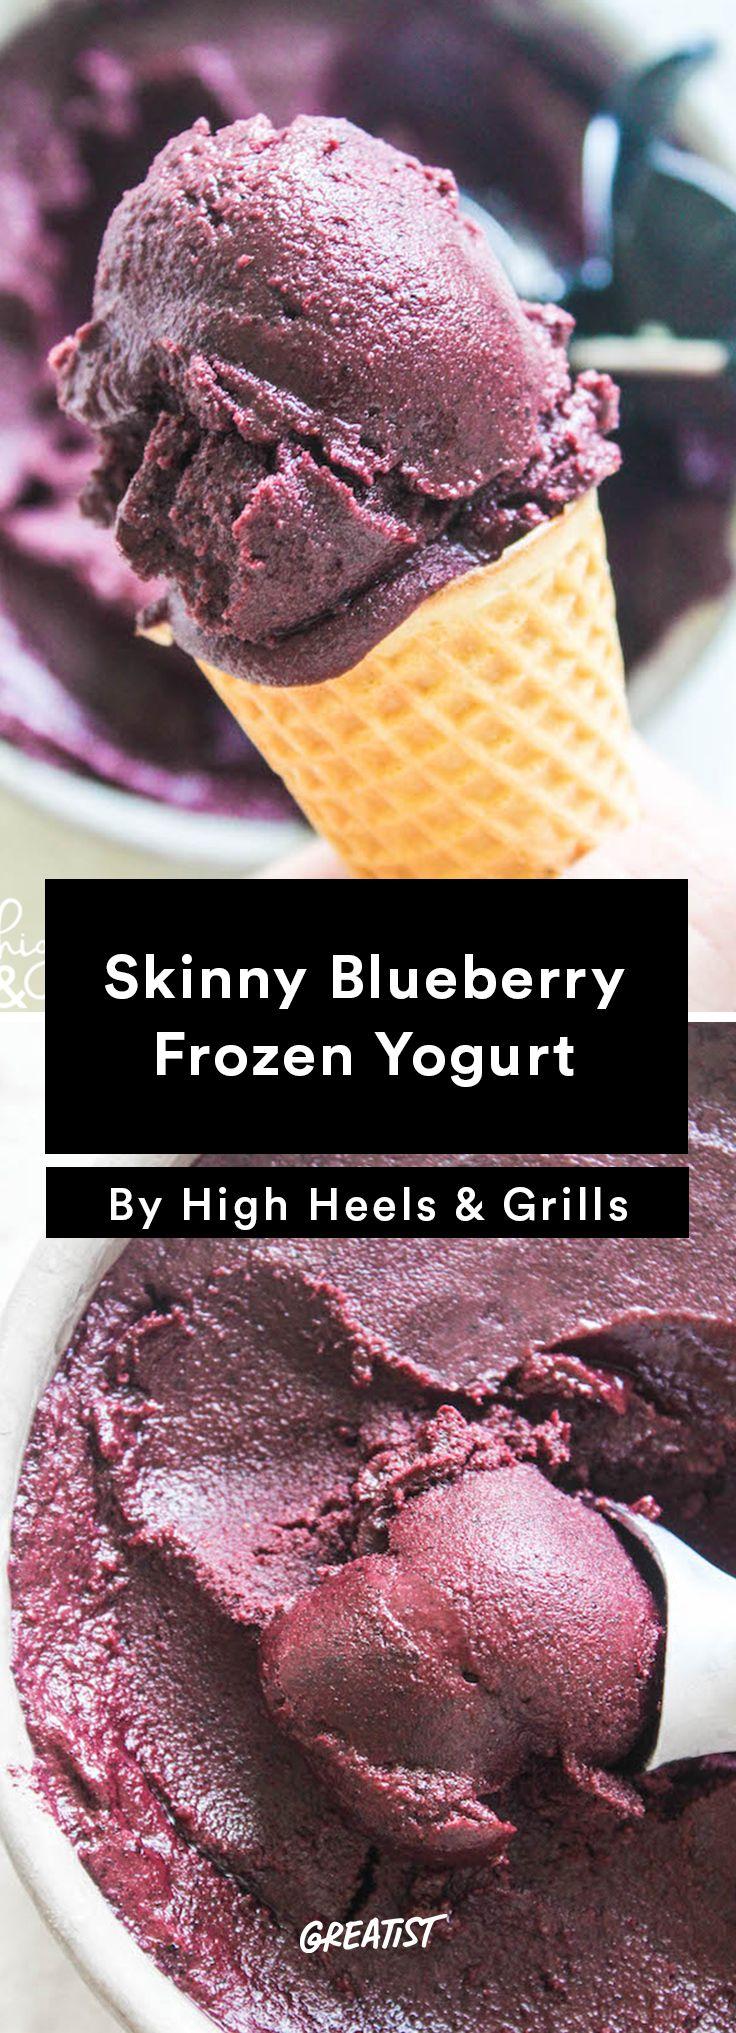 1. Skinny Blueberry Frozen Yogurt http://greatist.com/eat/frozen-yogurt-recipes-with-5-ingredients-or-less